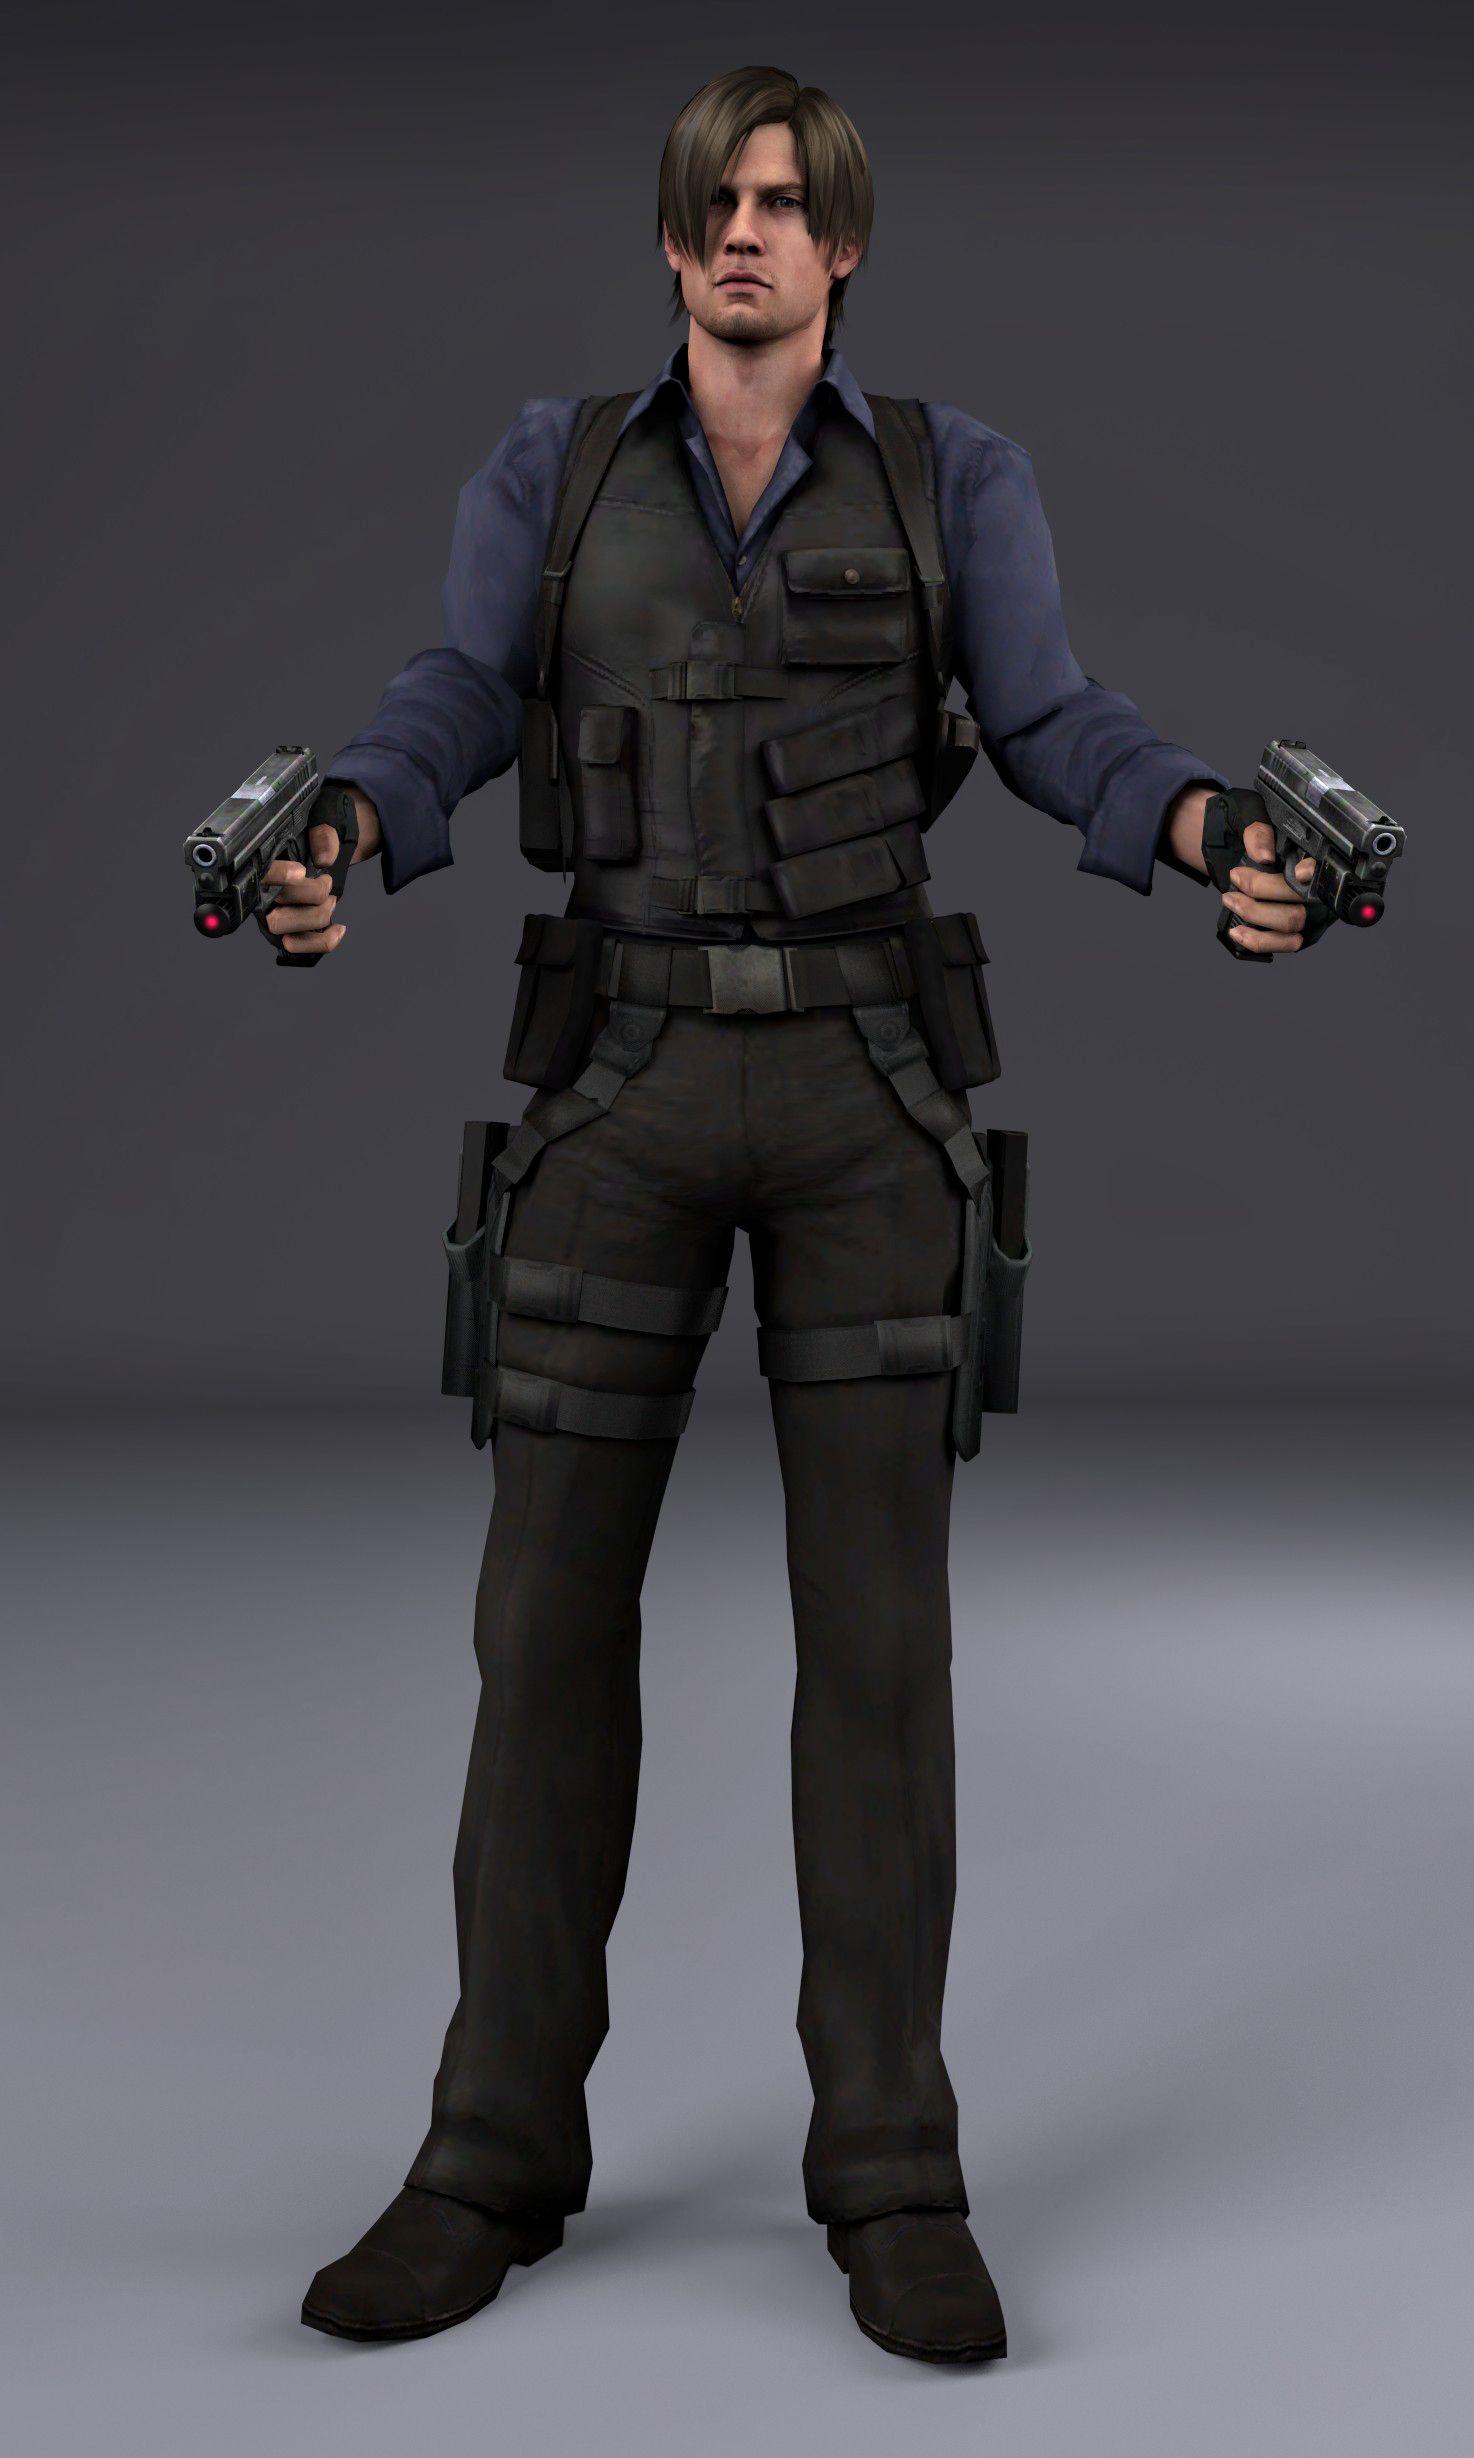 Resident Evil 6 Leon Render Google Search Leon S Kennedy